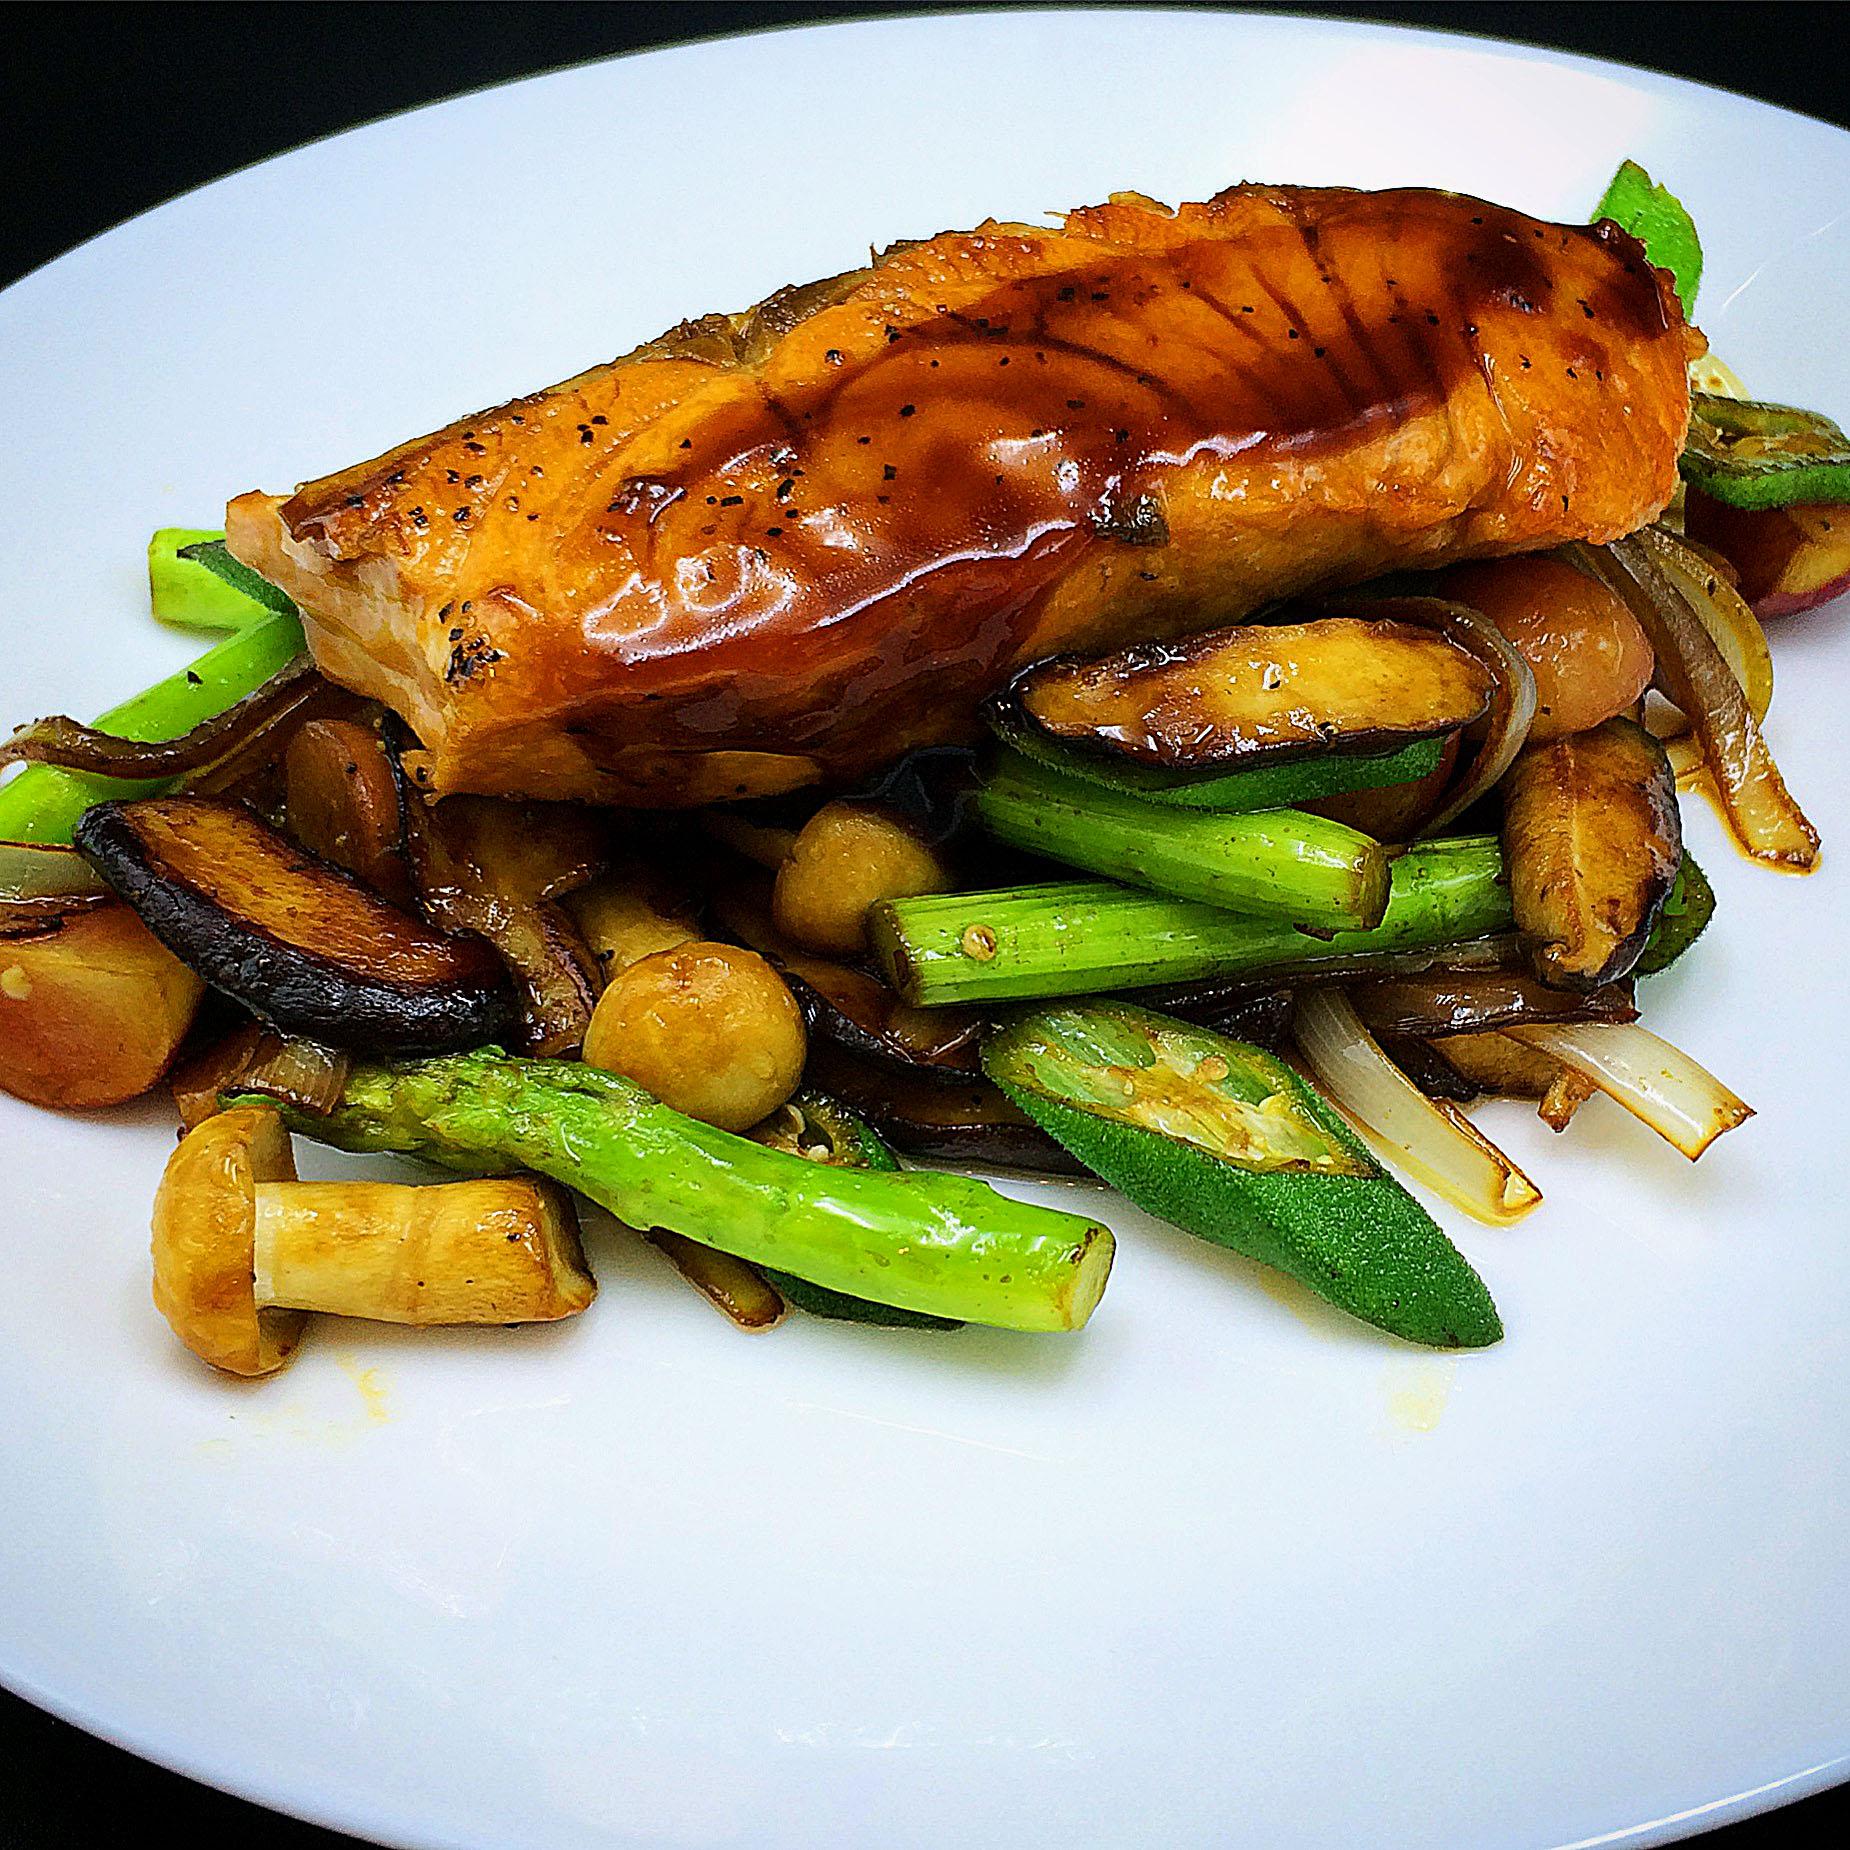 xinwei cook - terixaki salmon / via kitchen-impossible.net